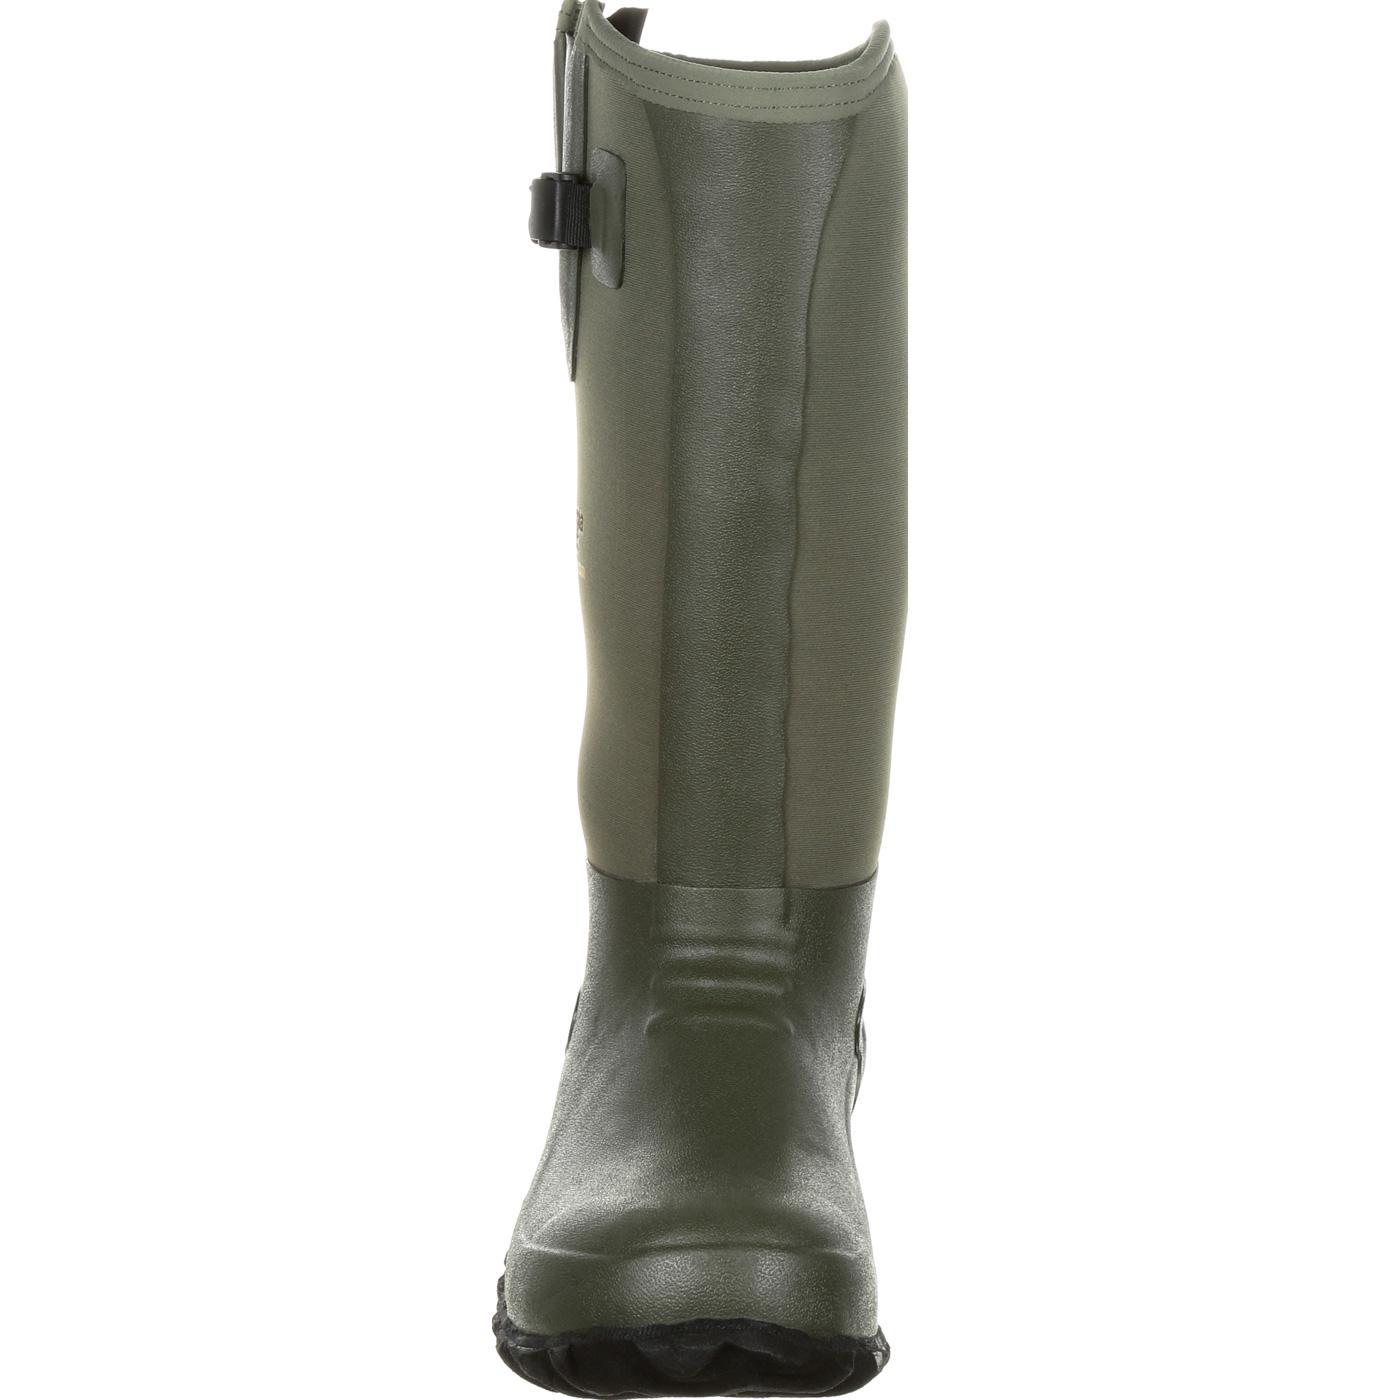 84757a87811 Georgia Boot Waterproof Rubber Boot